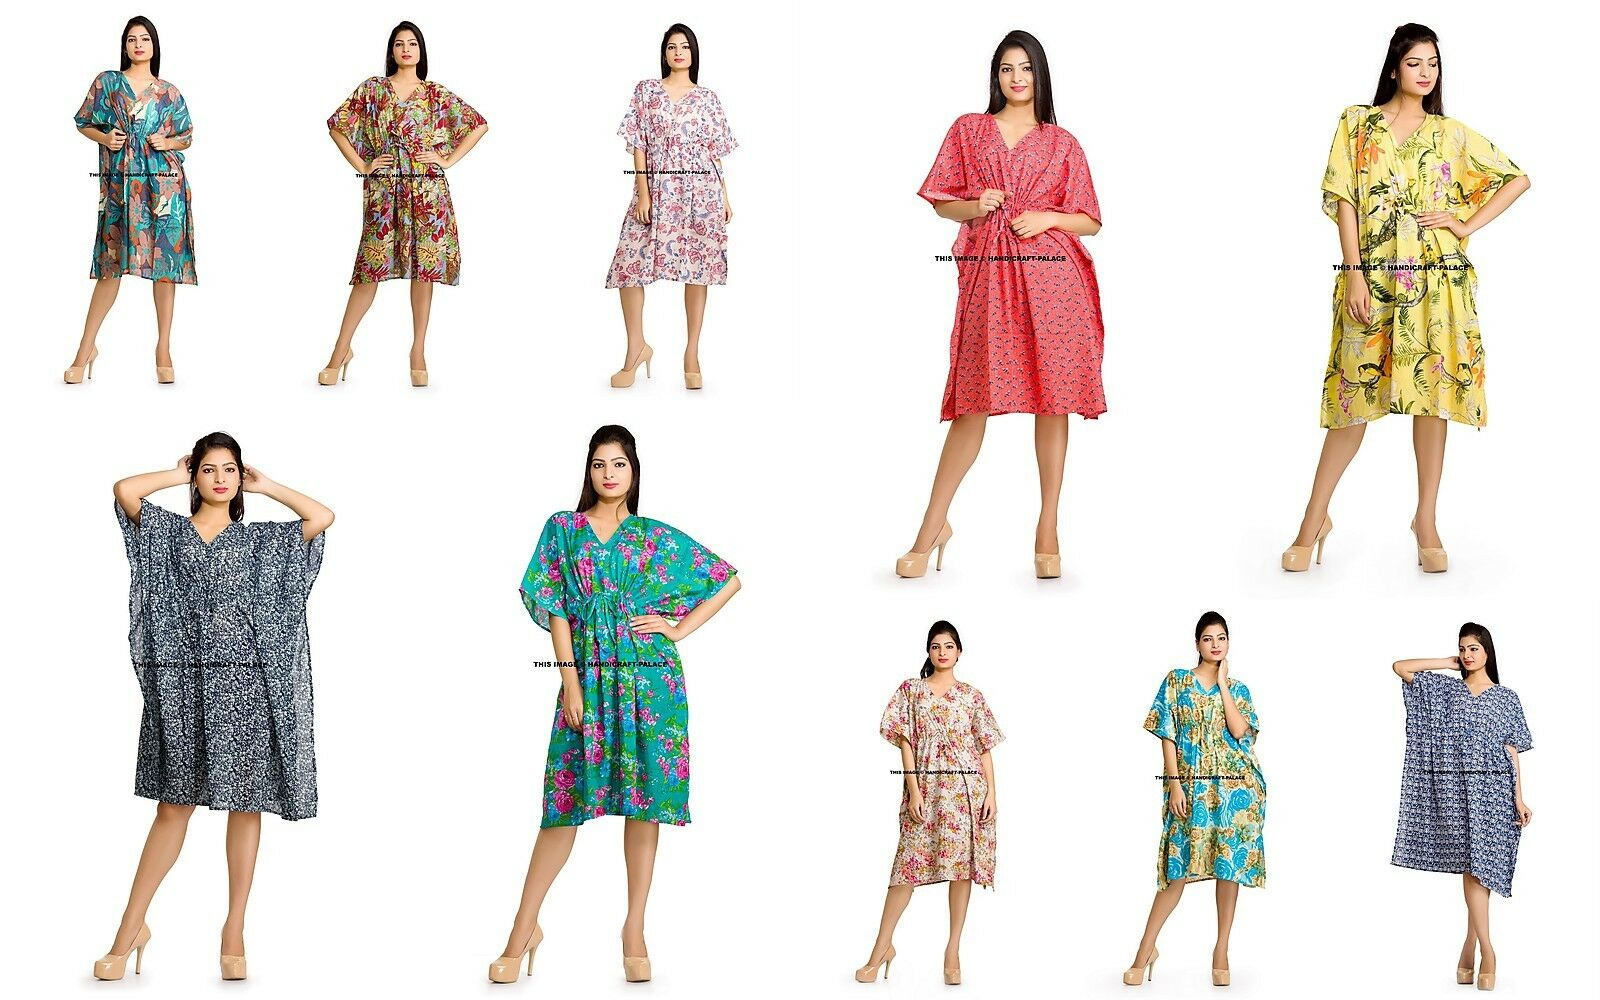 10 Wholesale Lot Short Cotton Caftan Kaftan Night Beach Wear Maxi Dress Bohemian